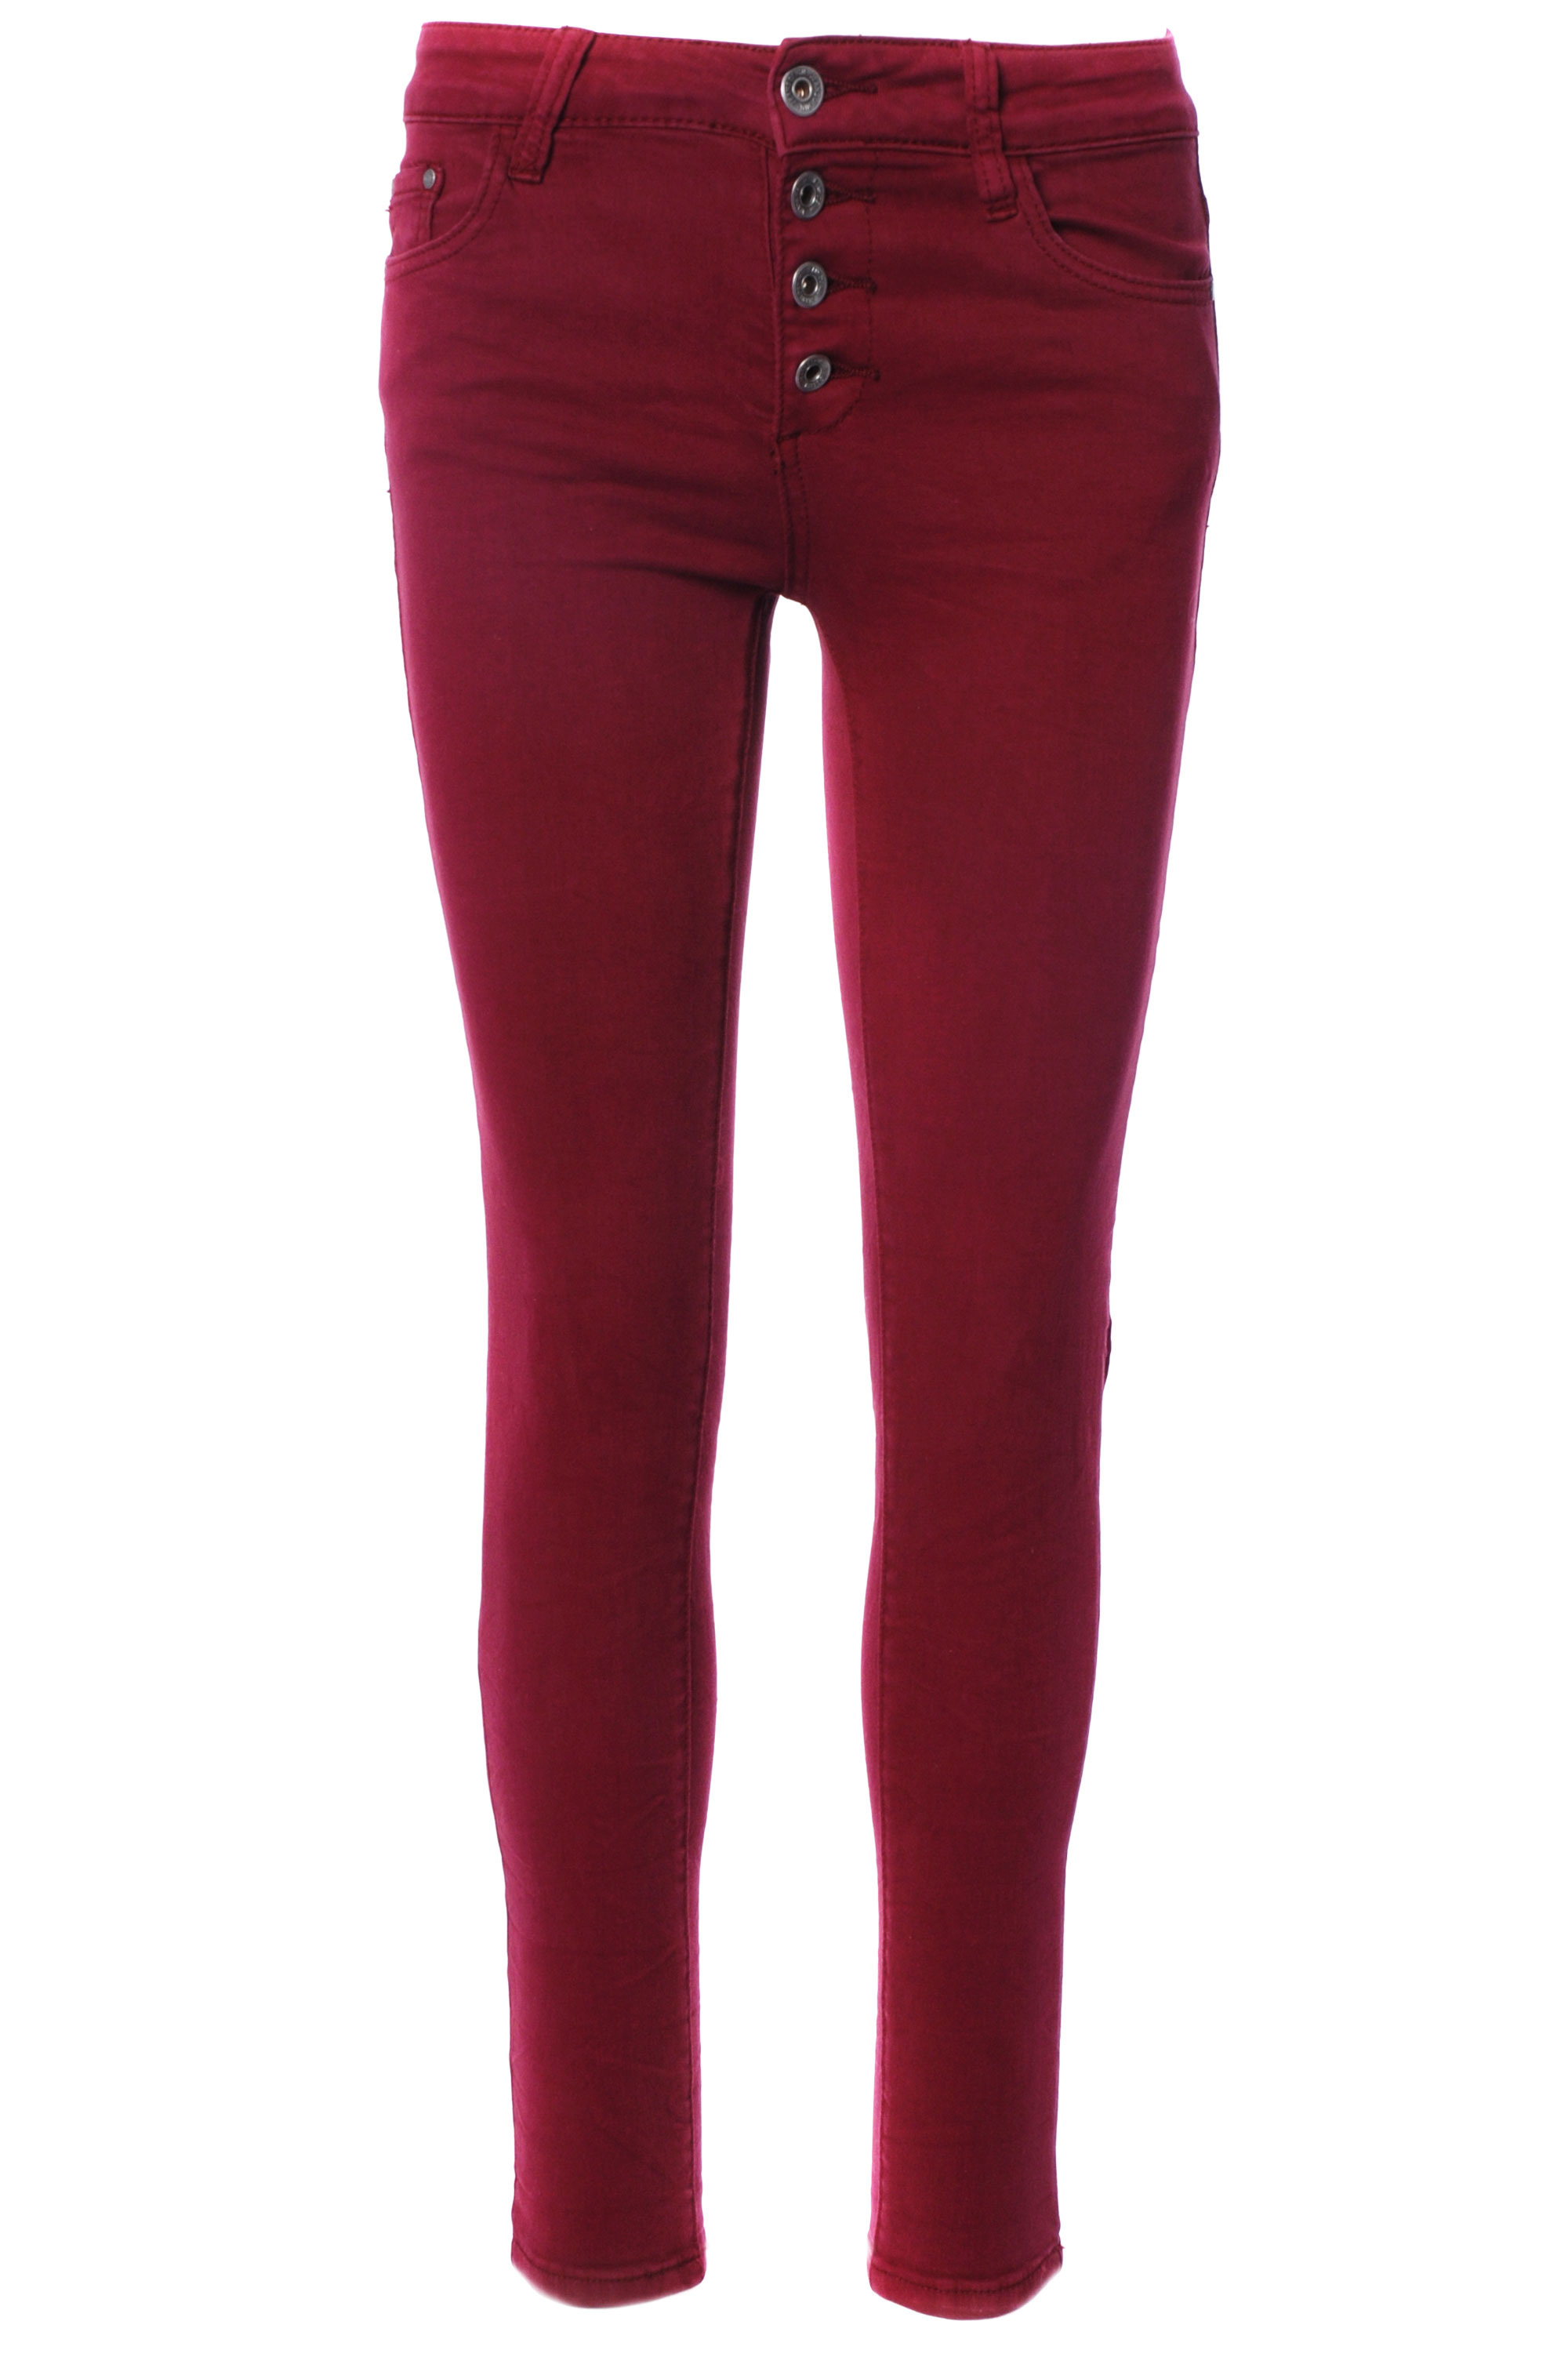 Spodnie - 42-6110 BORDO - Unisono